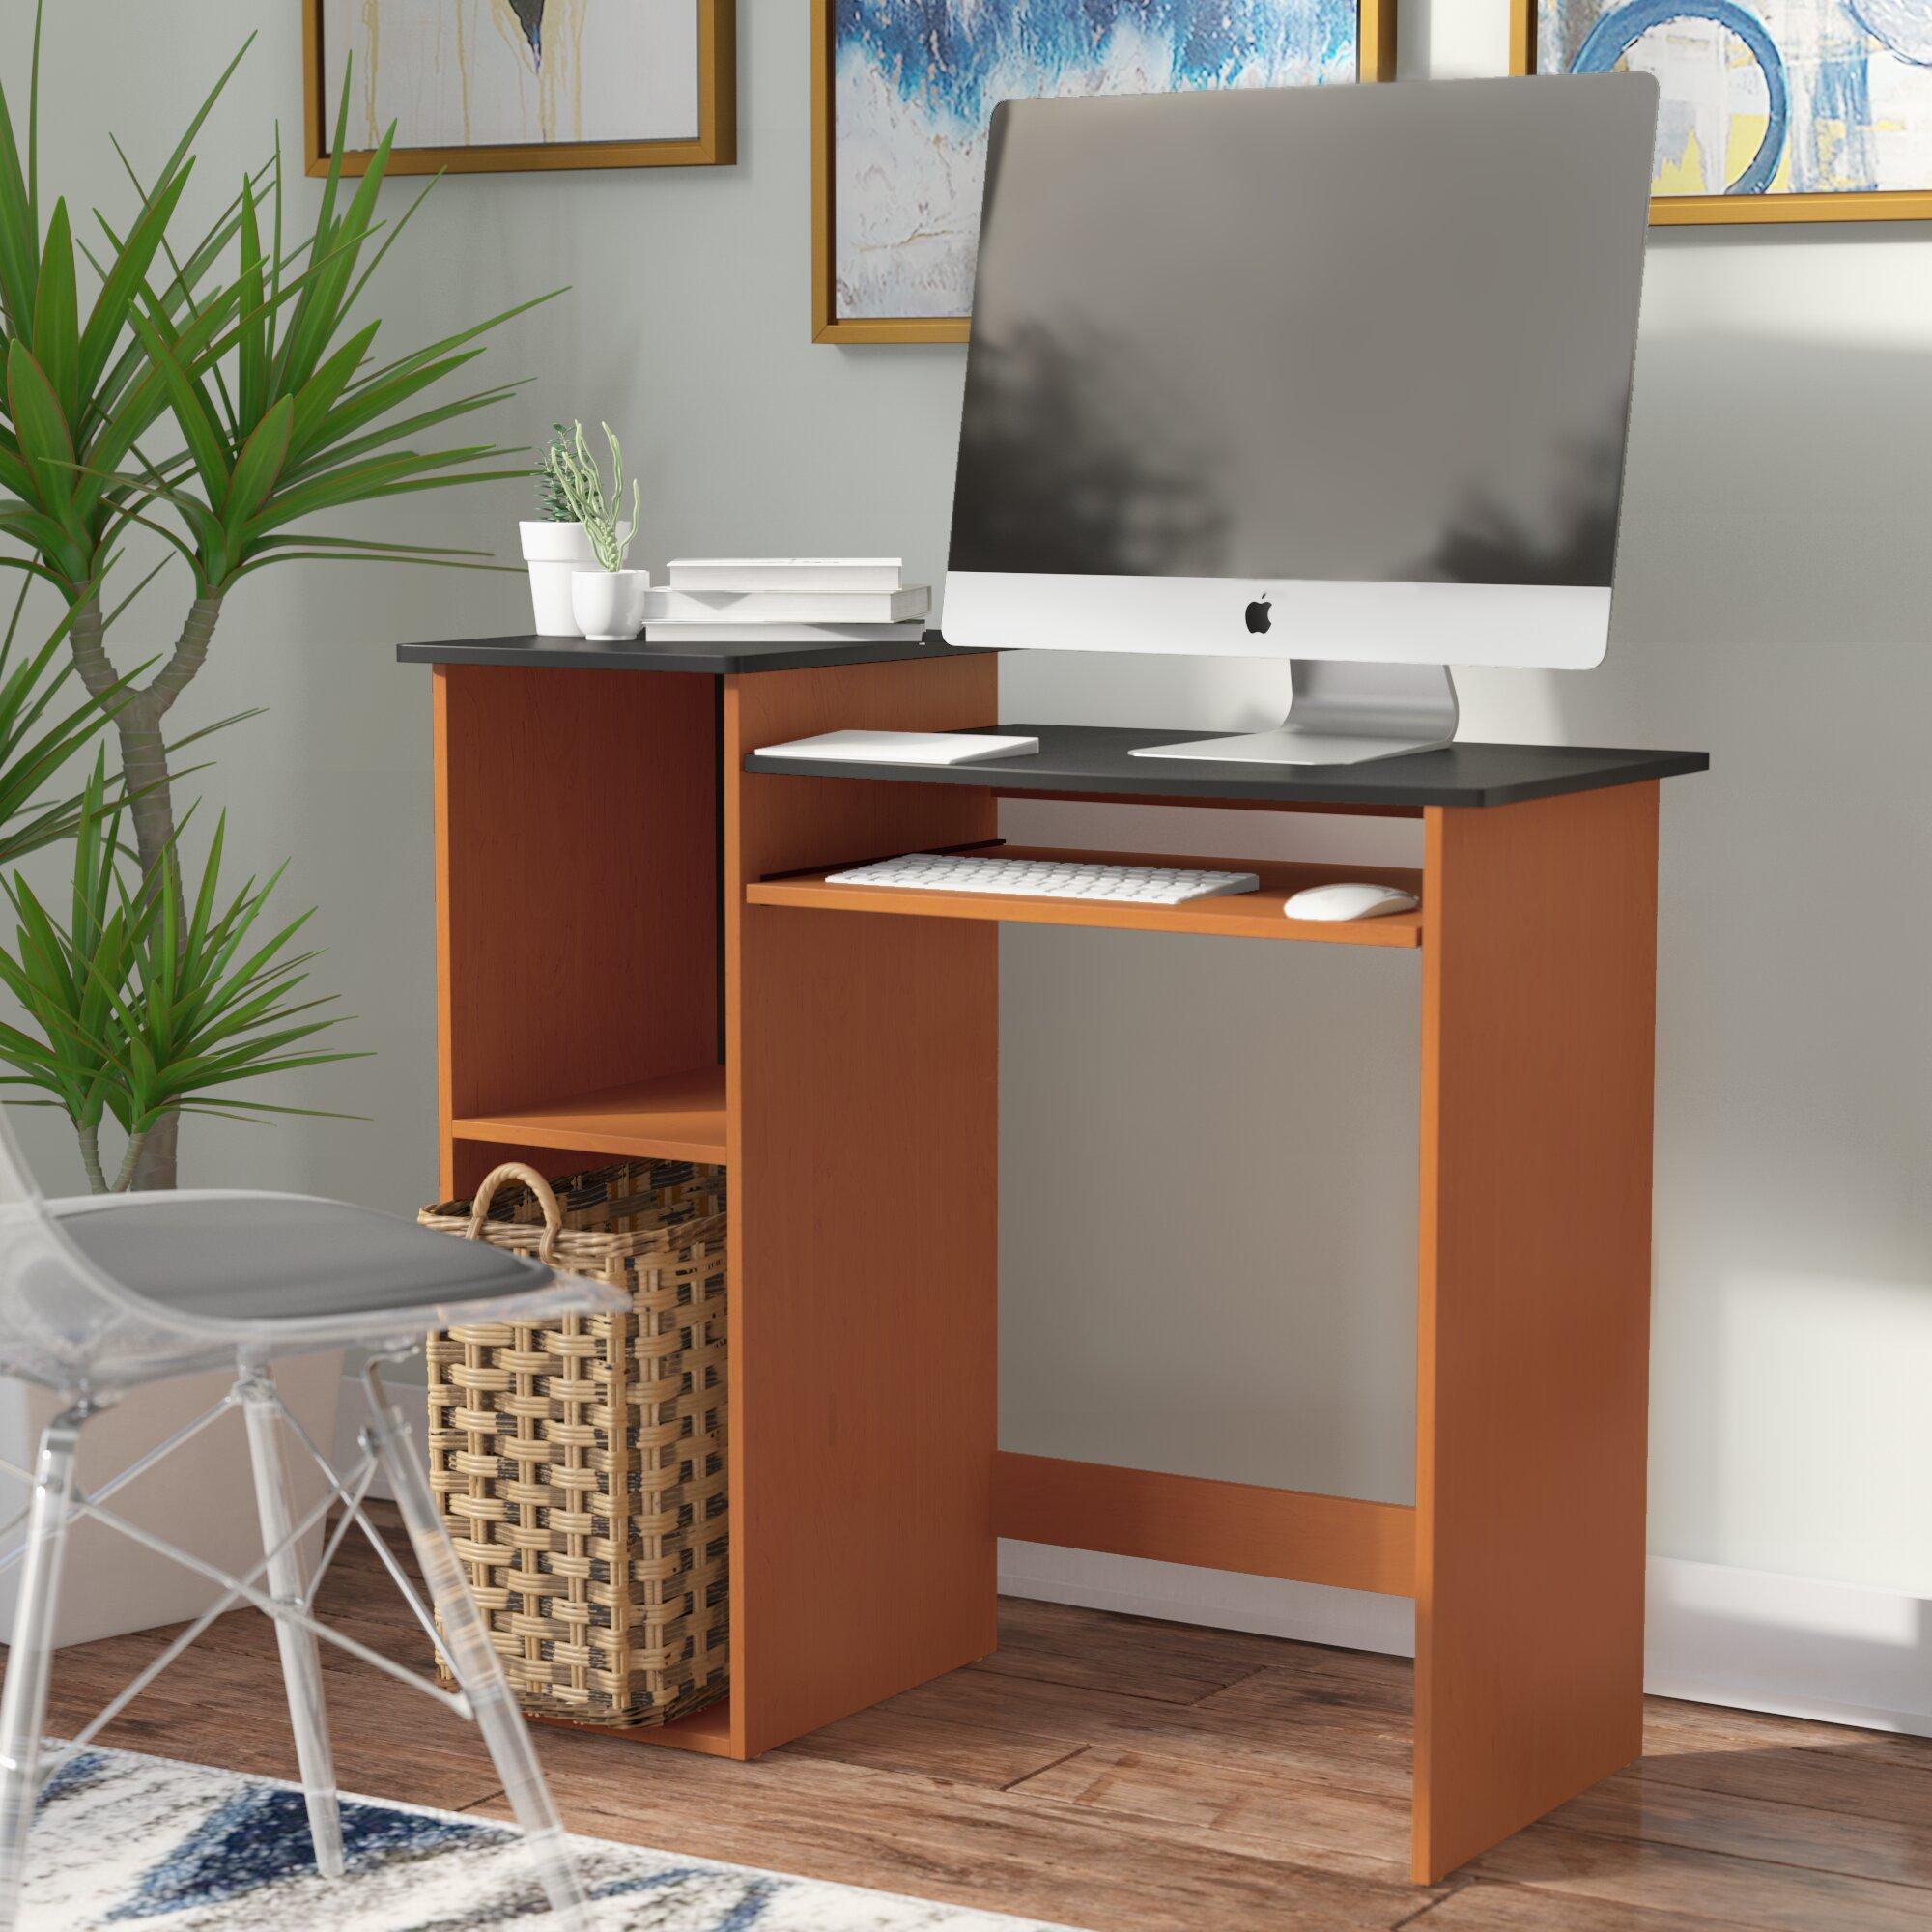 dorm brown room office computer product homcom wood shop tray table keyboard rakuten aosom with desk home